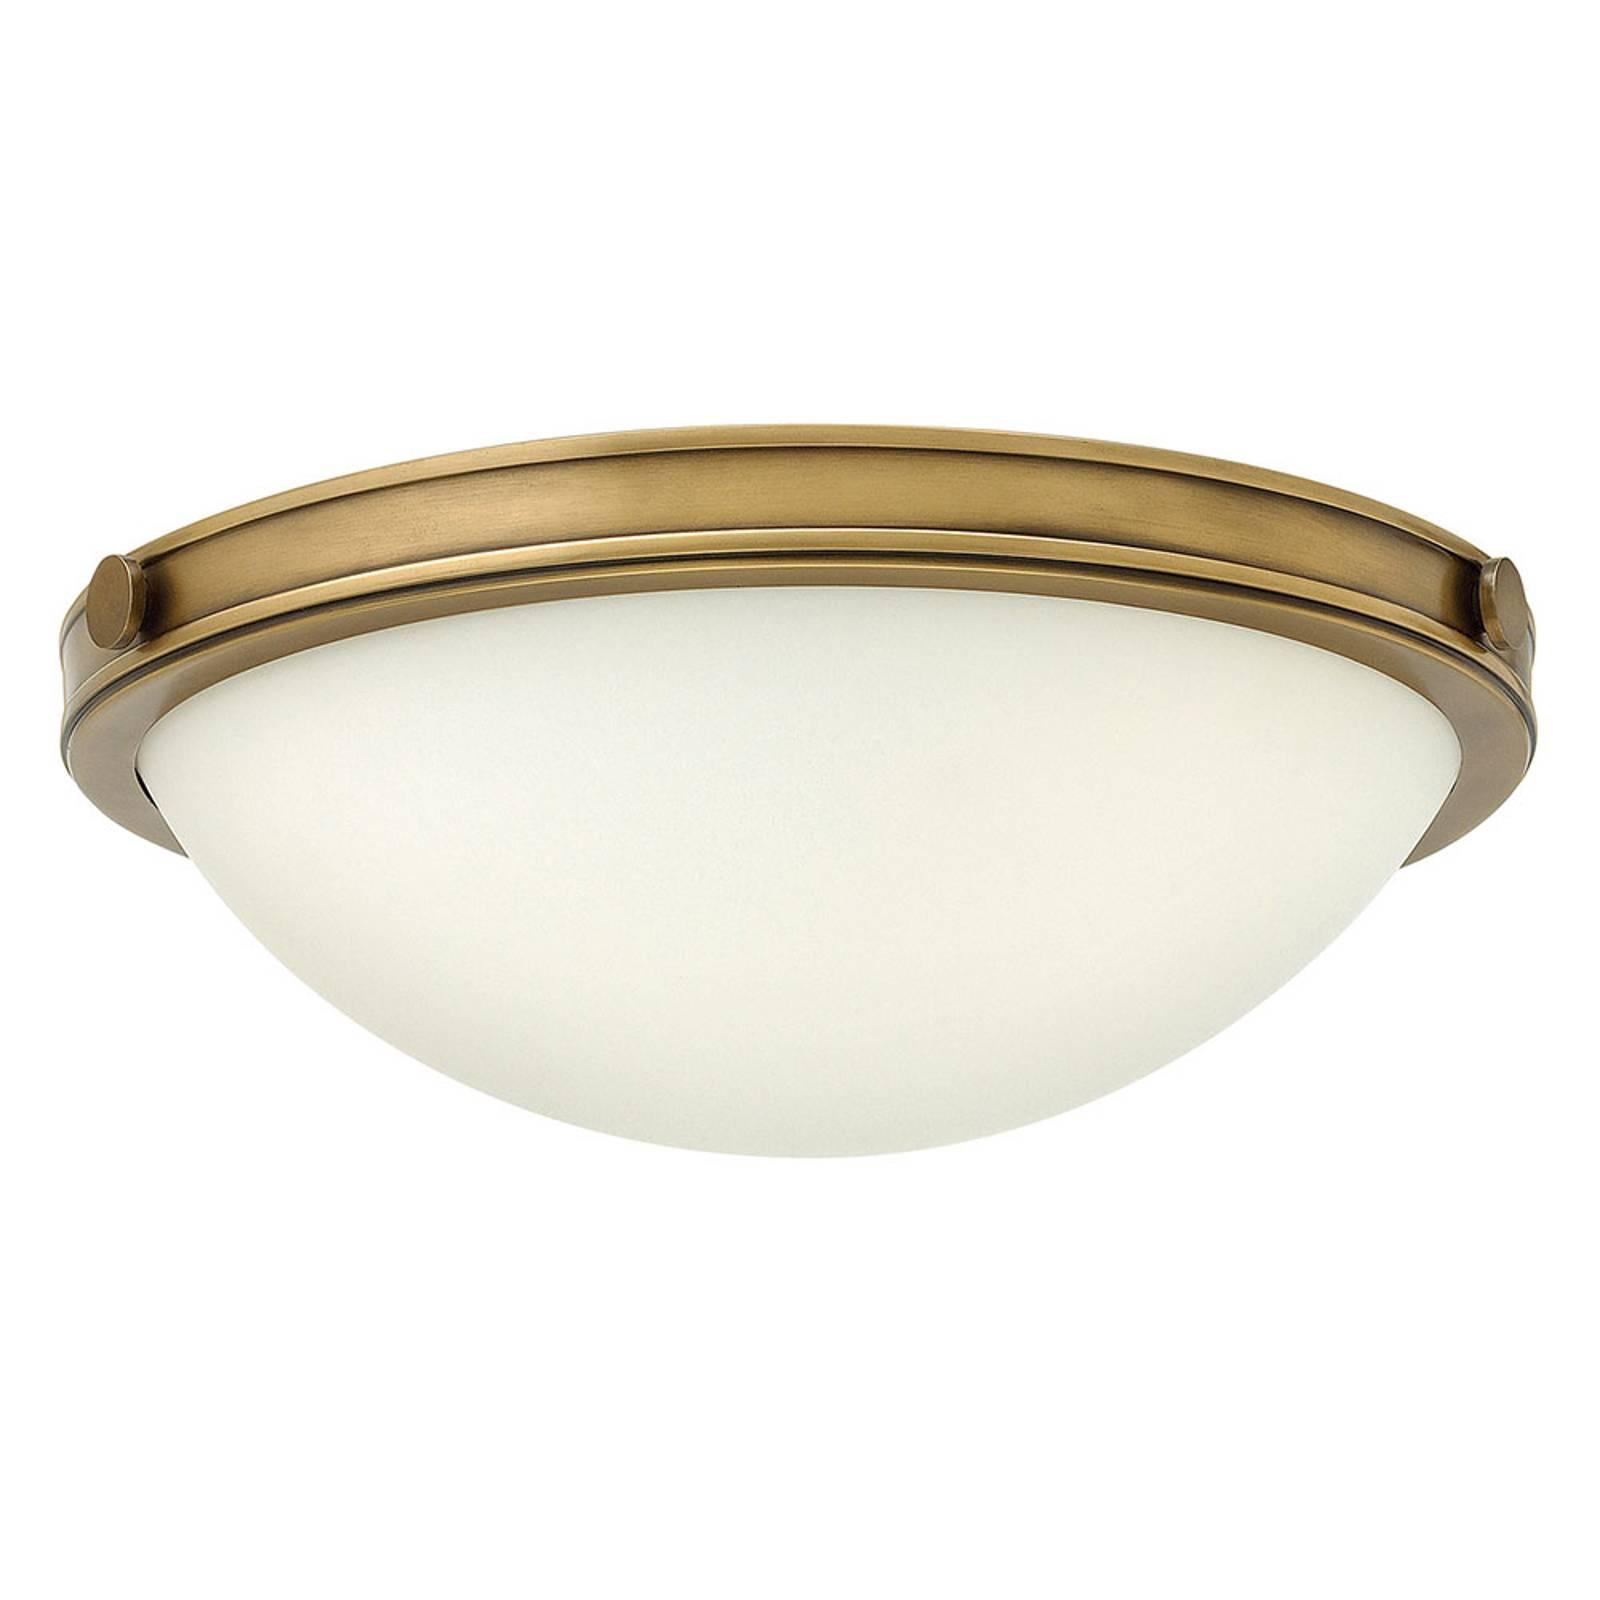 Plafondlamp Collier met messing finish 34,6cm